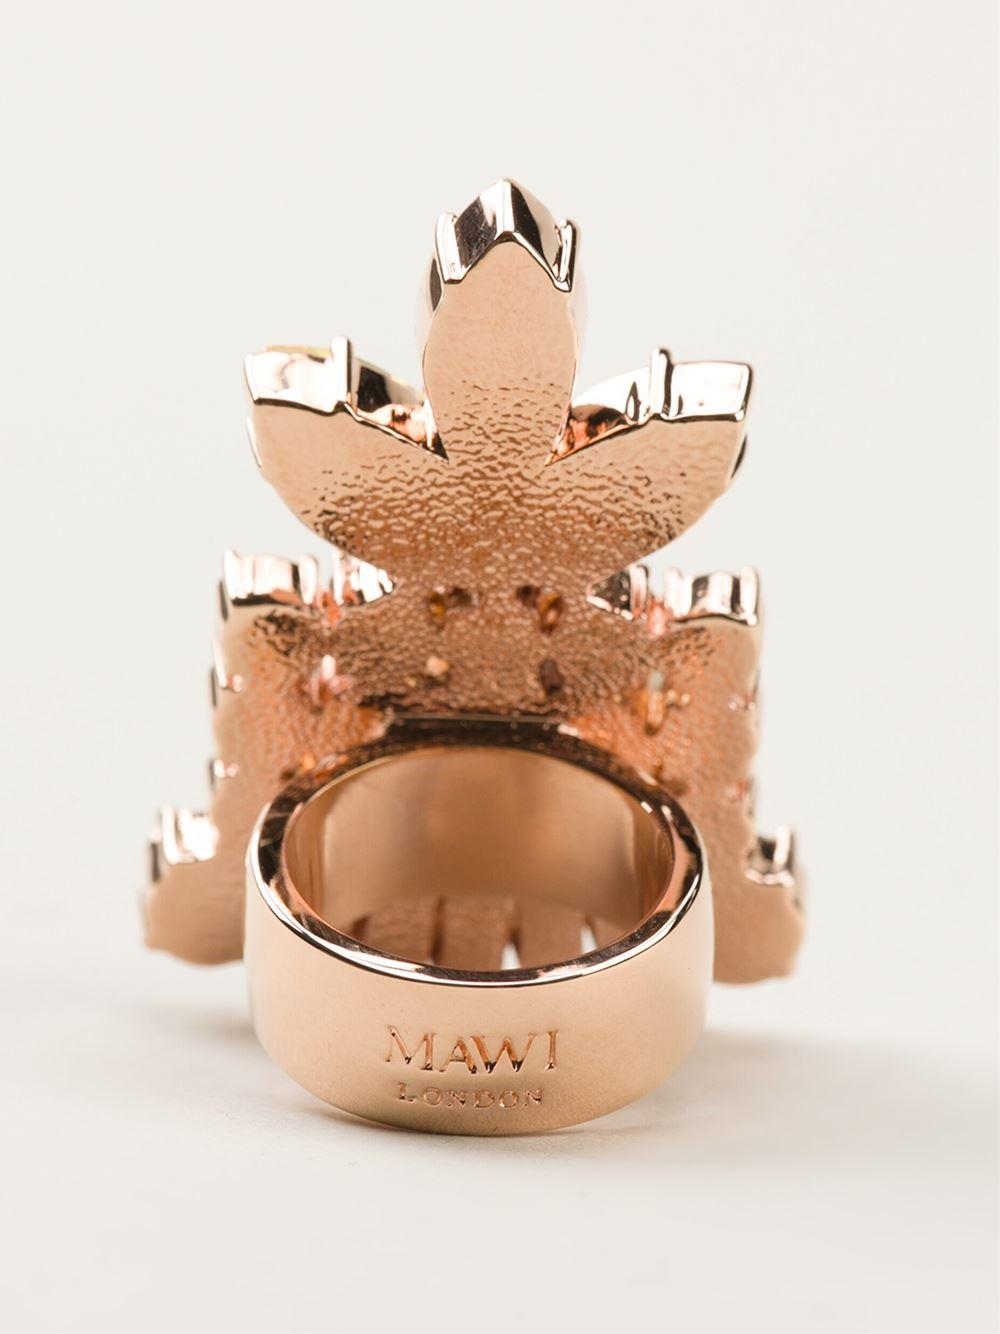 Mawi Embellished Chunky Ring - Nike - Via Verdi - Farfetch.com